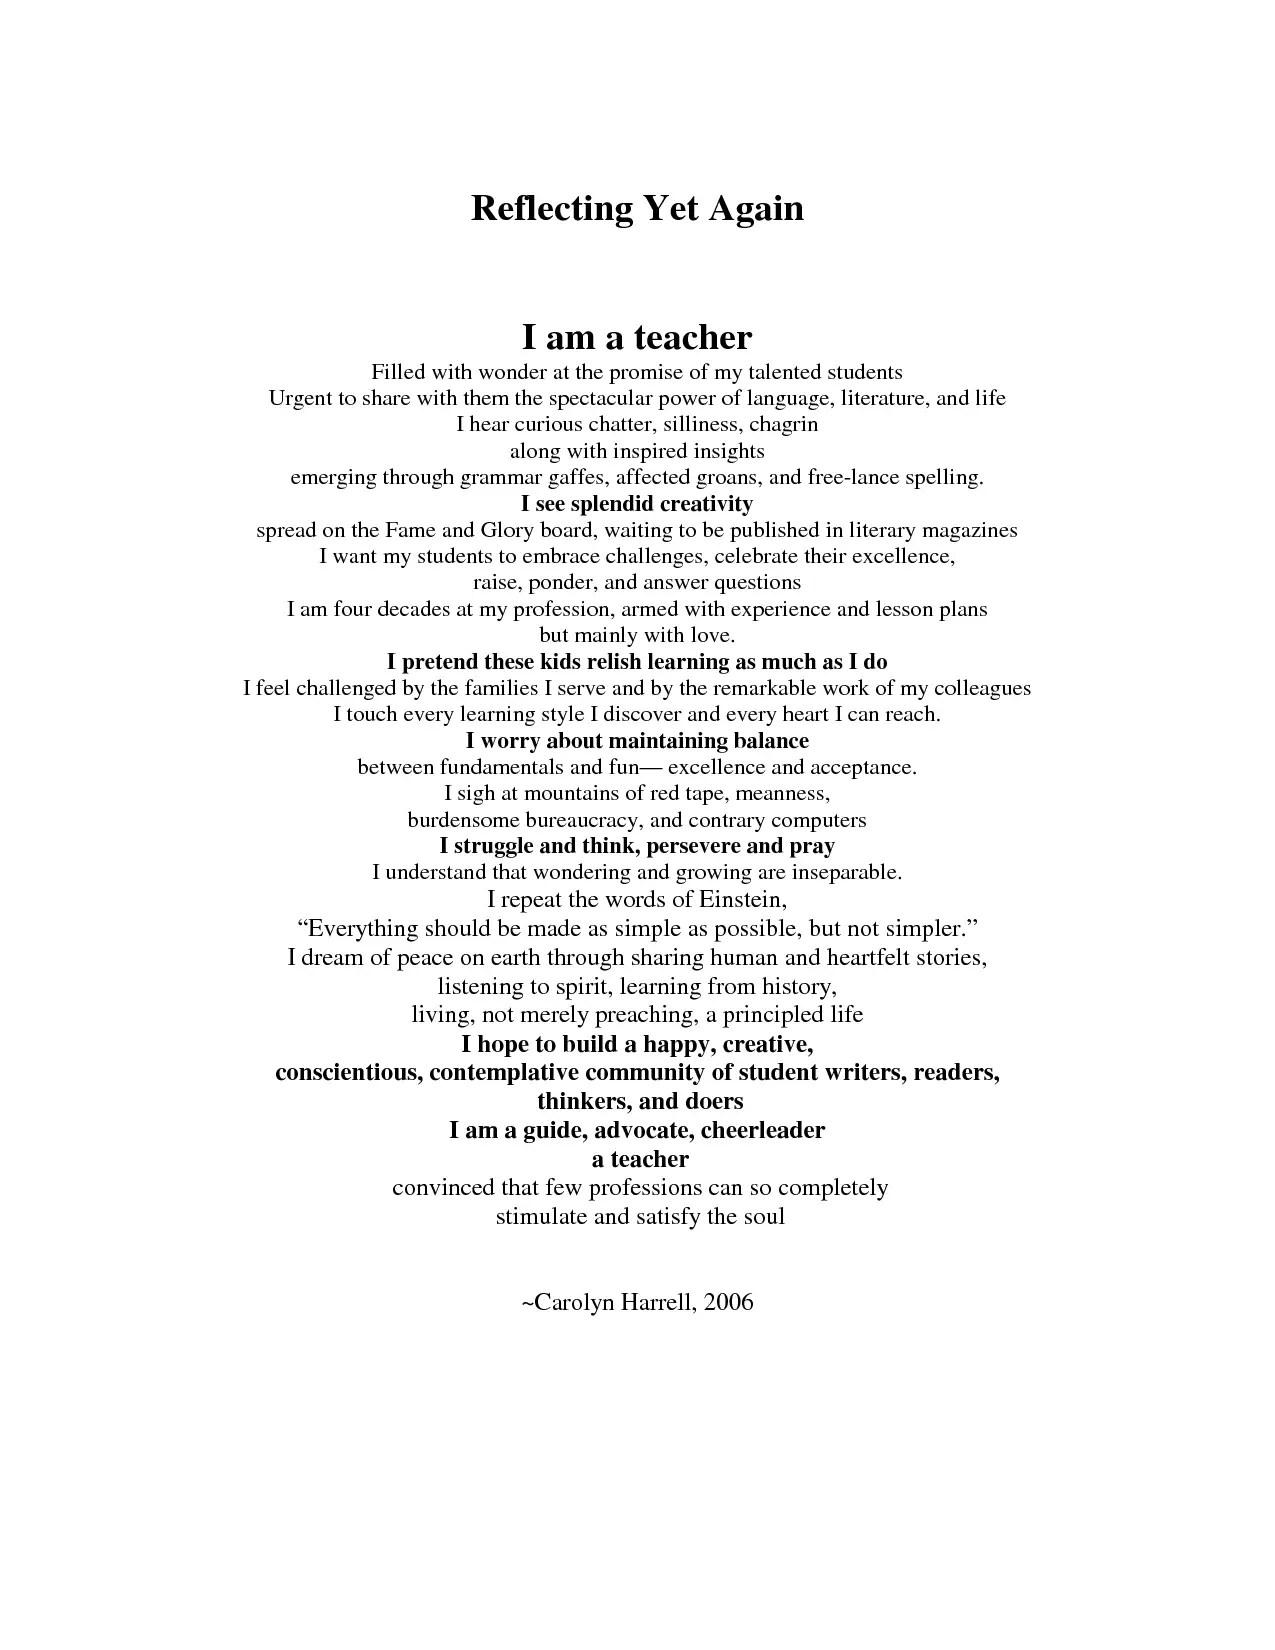 Examples Of Bio Poems